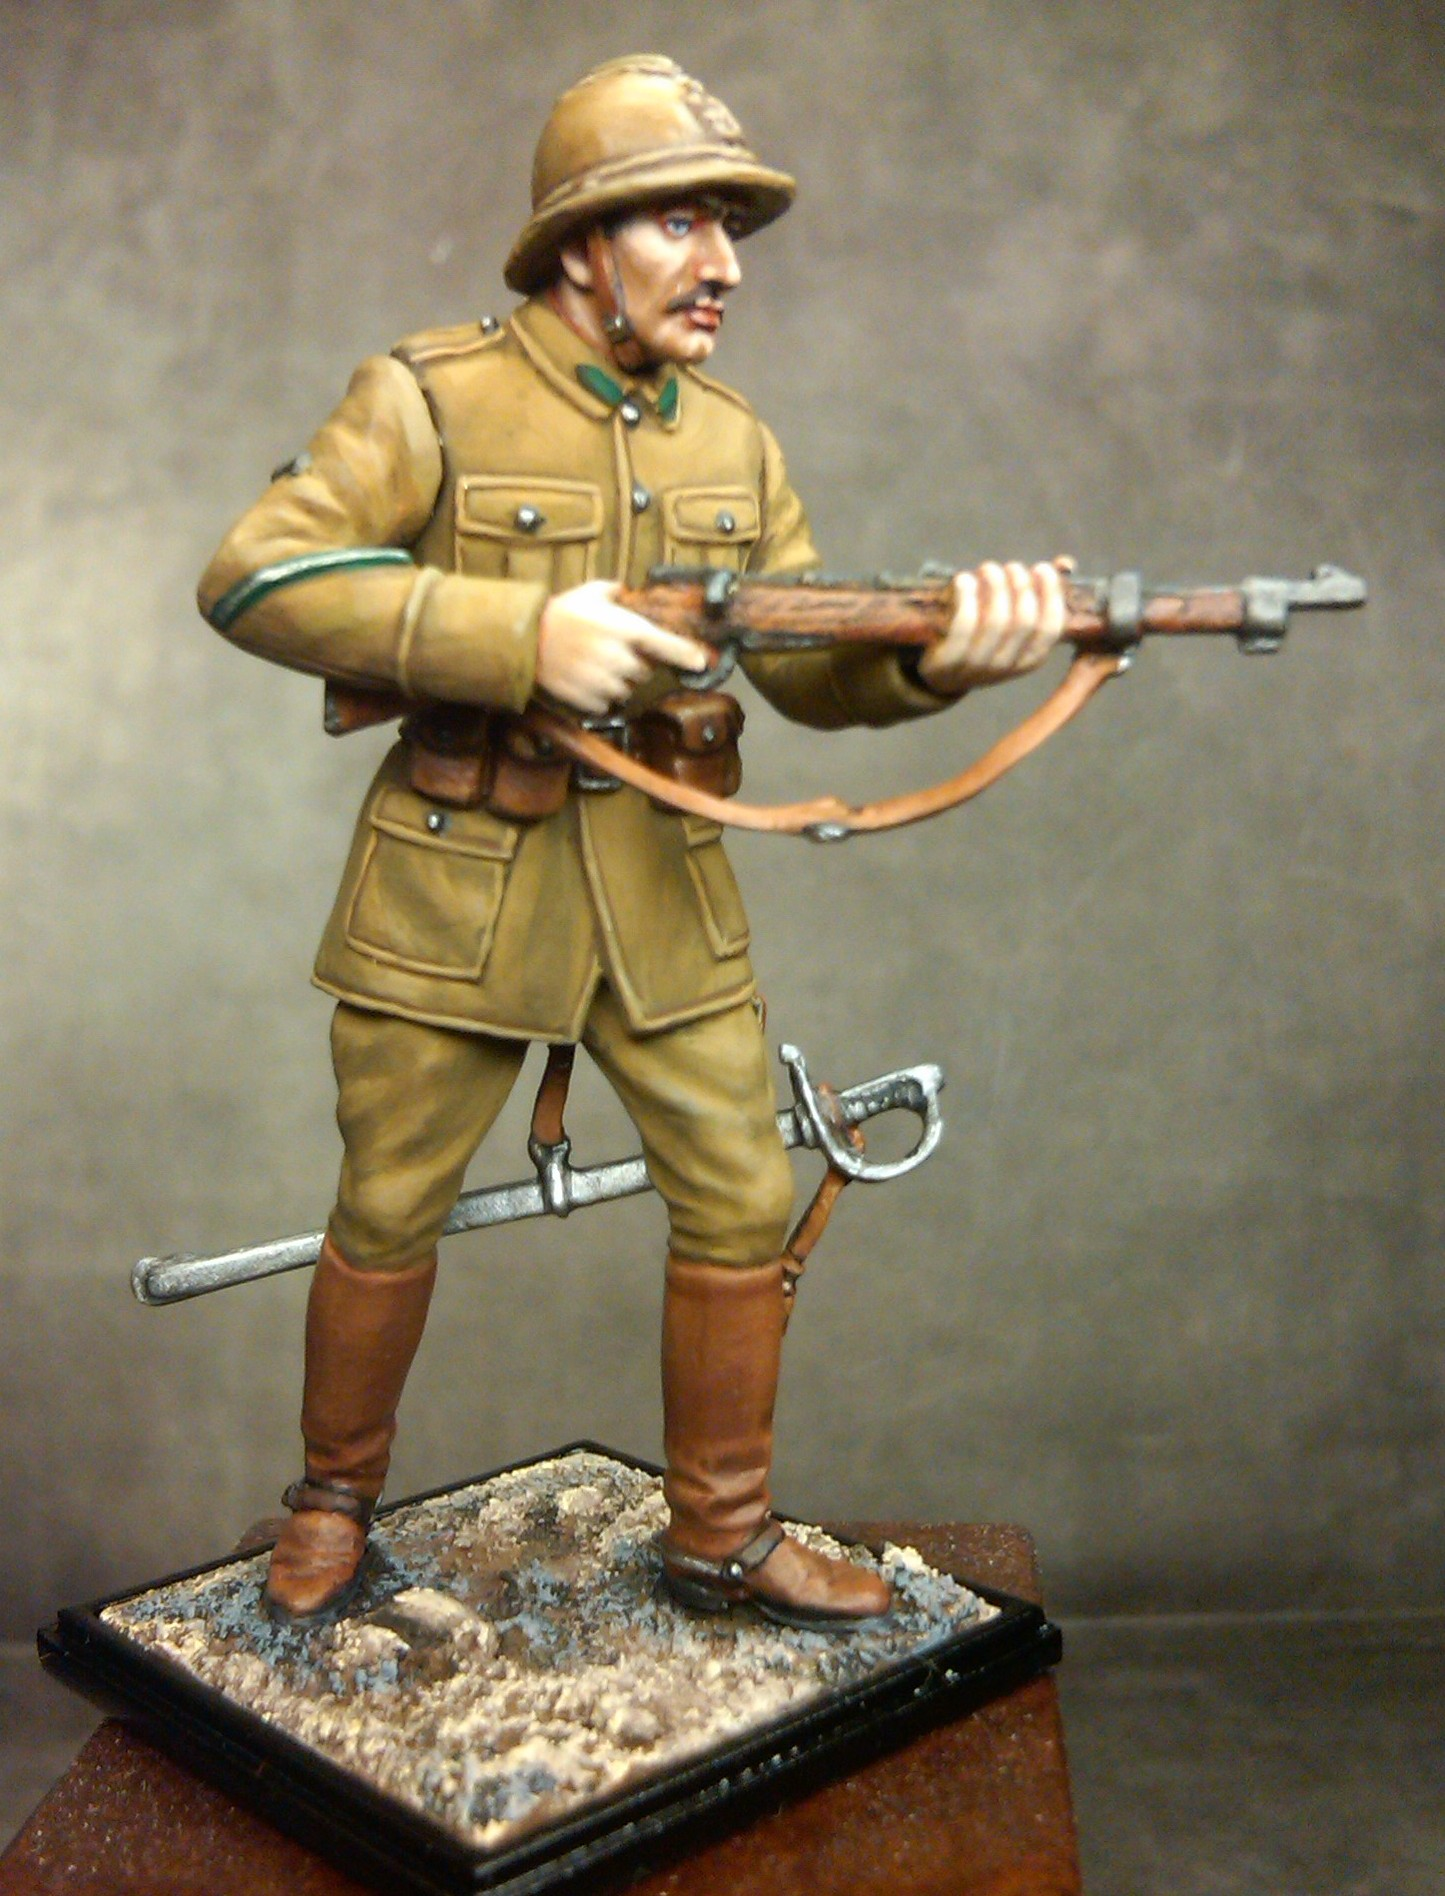 greek cavalry ,1921, Asia Minor campaign, greek army, ελληνας στρατιωτης, ιππικό, Μικρά Ασία,